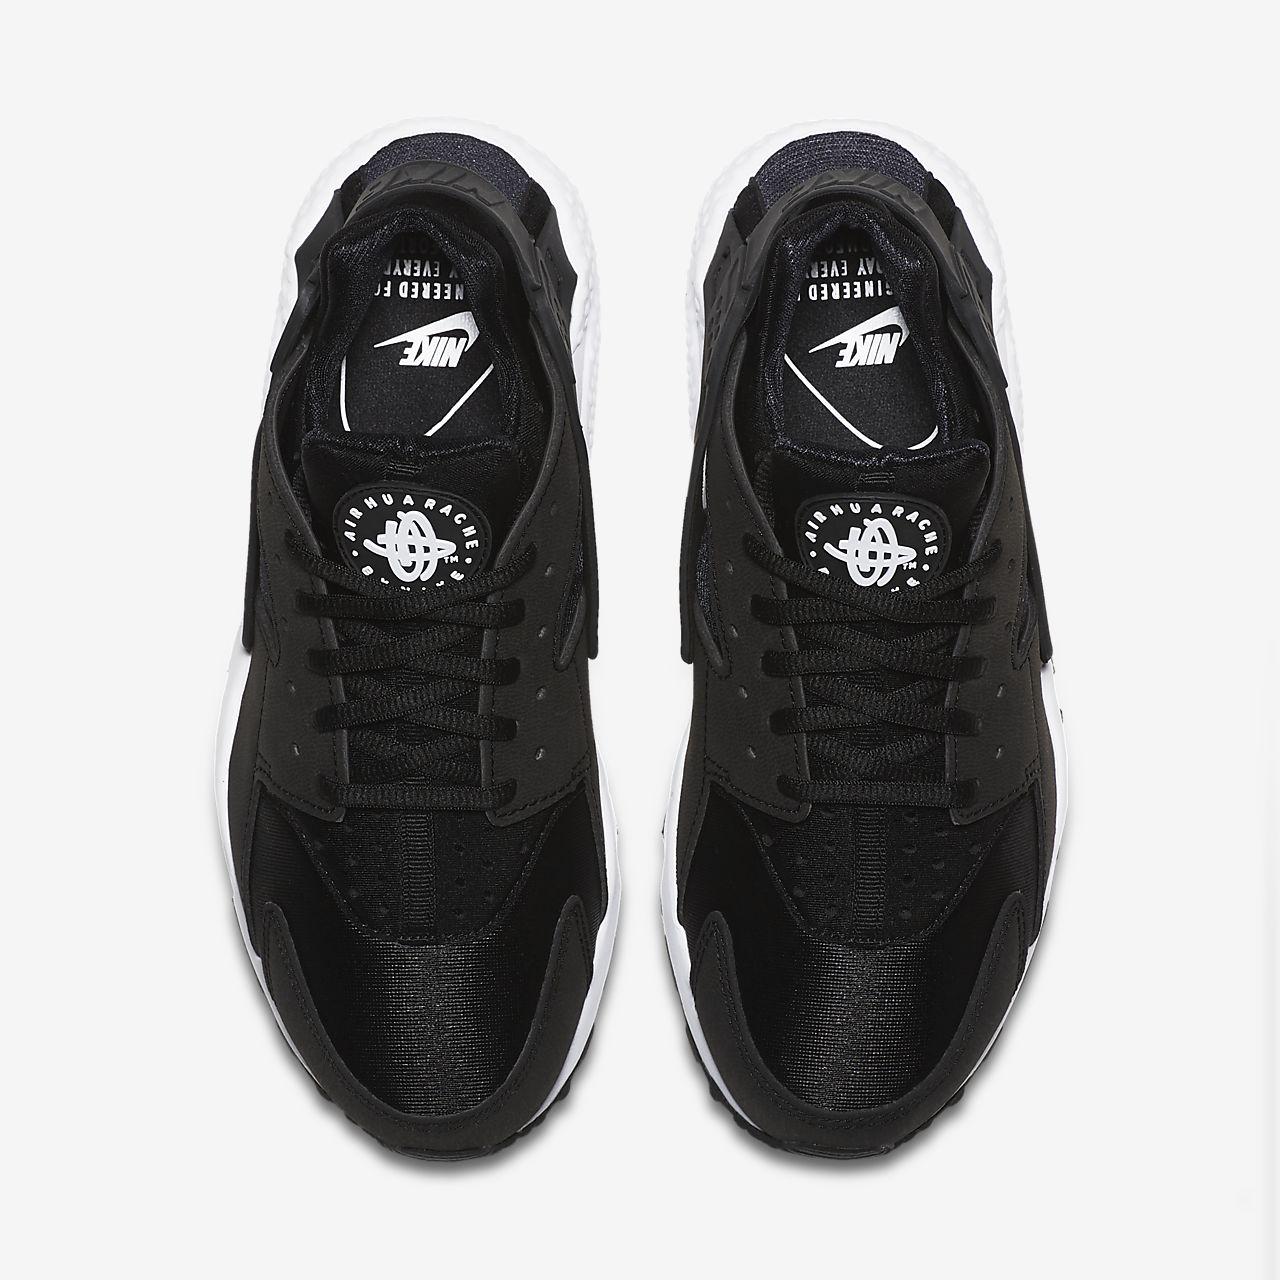 Air Huarache Nerobianconero Nike Scarpa 006 634835 y0vmN8nOw